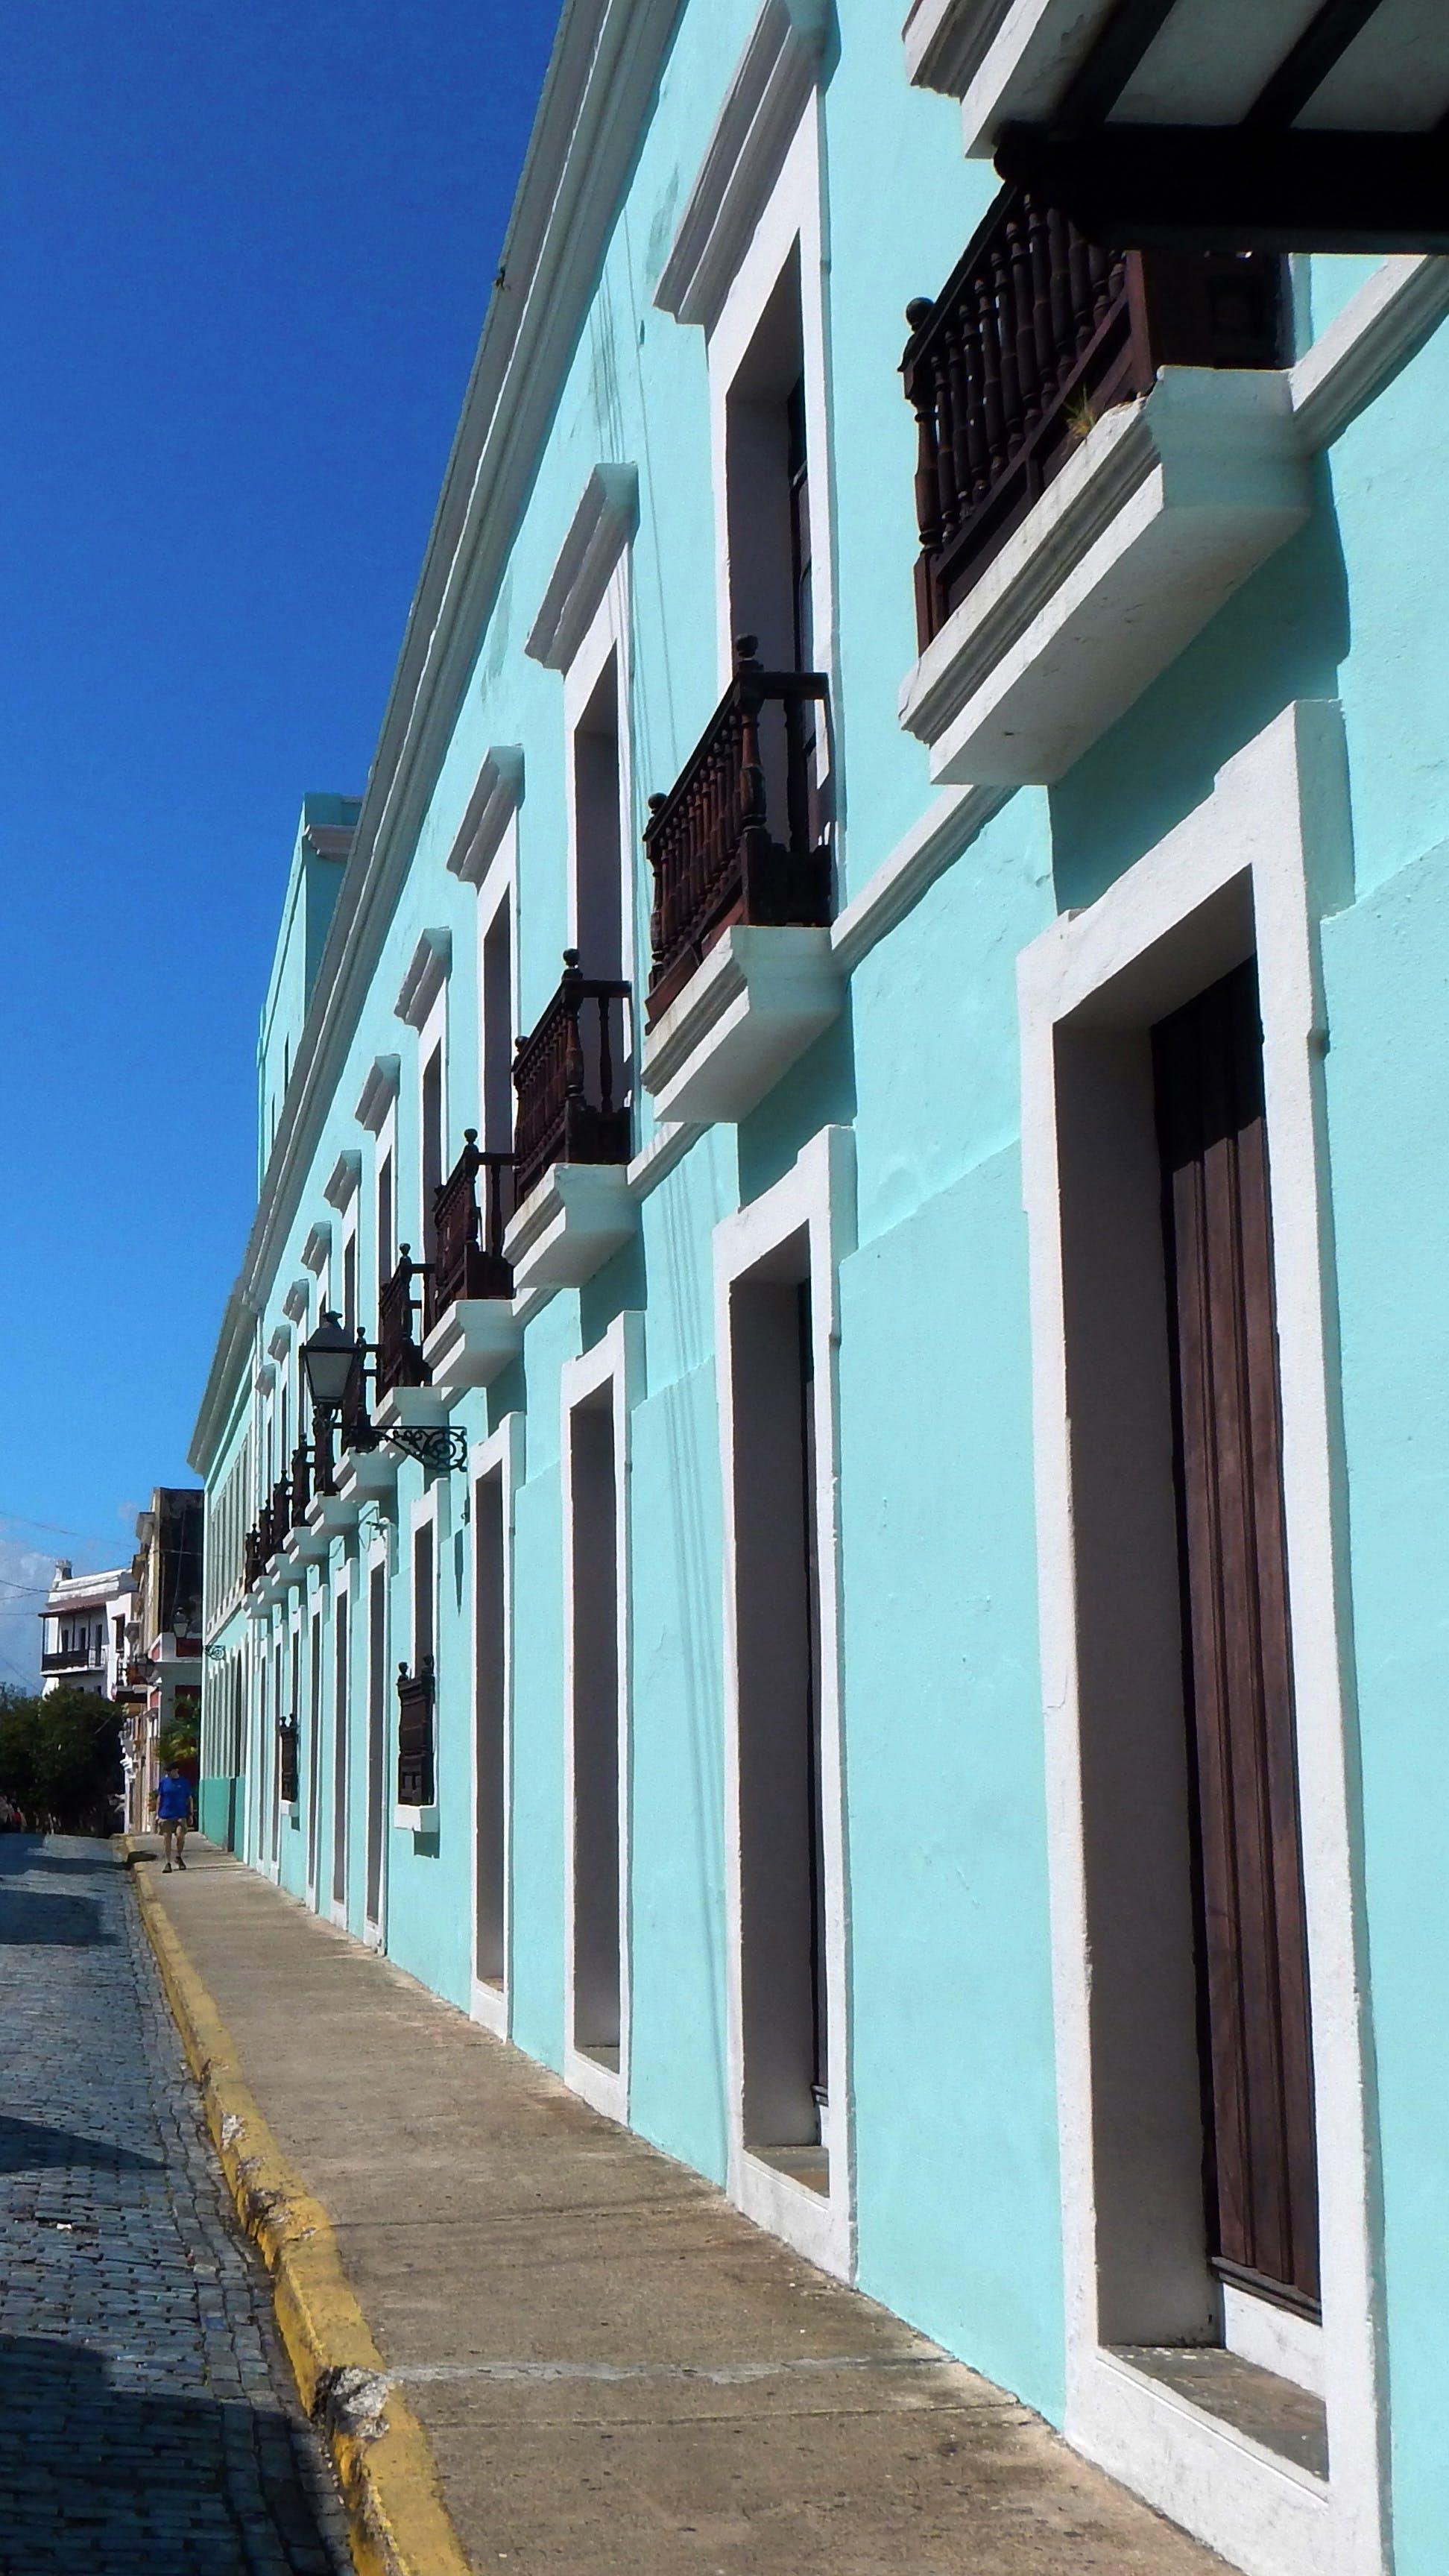 Free stock photo of architecture, street